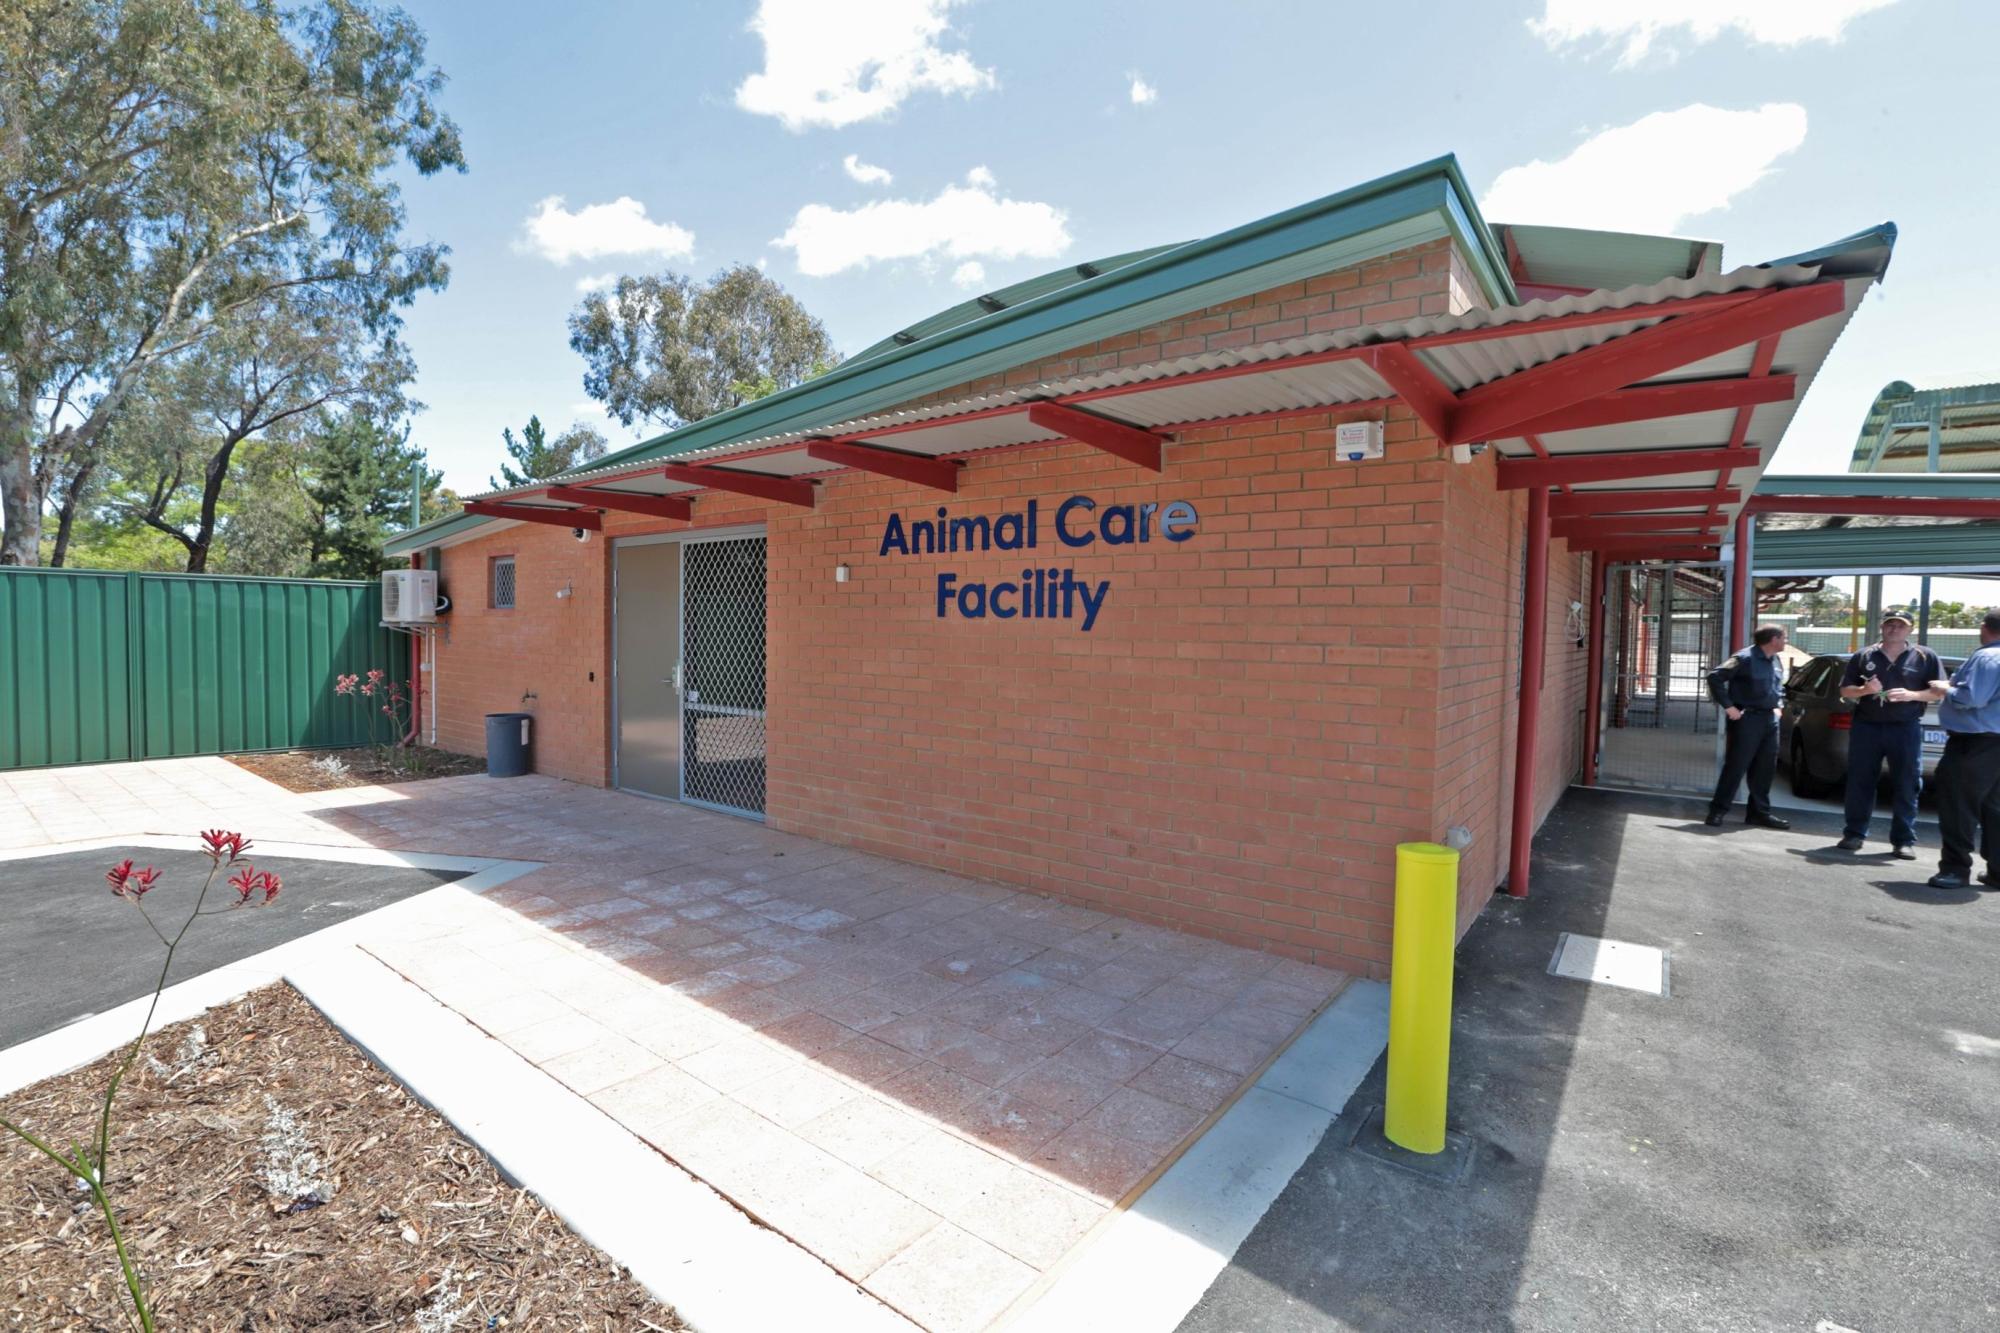 Animal Care Facility.